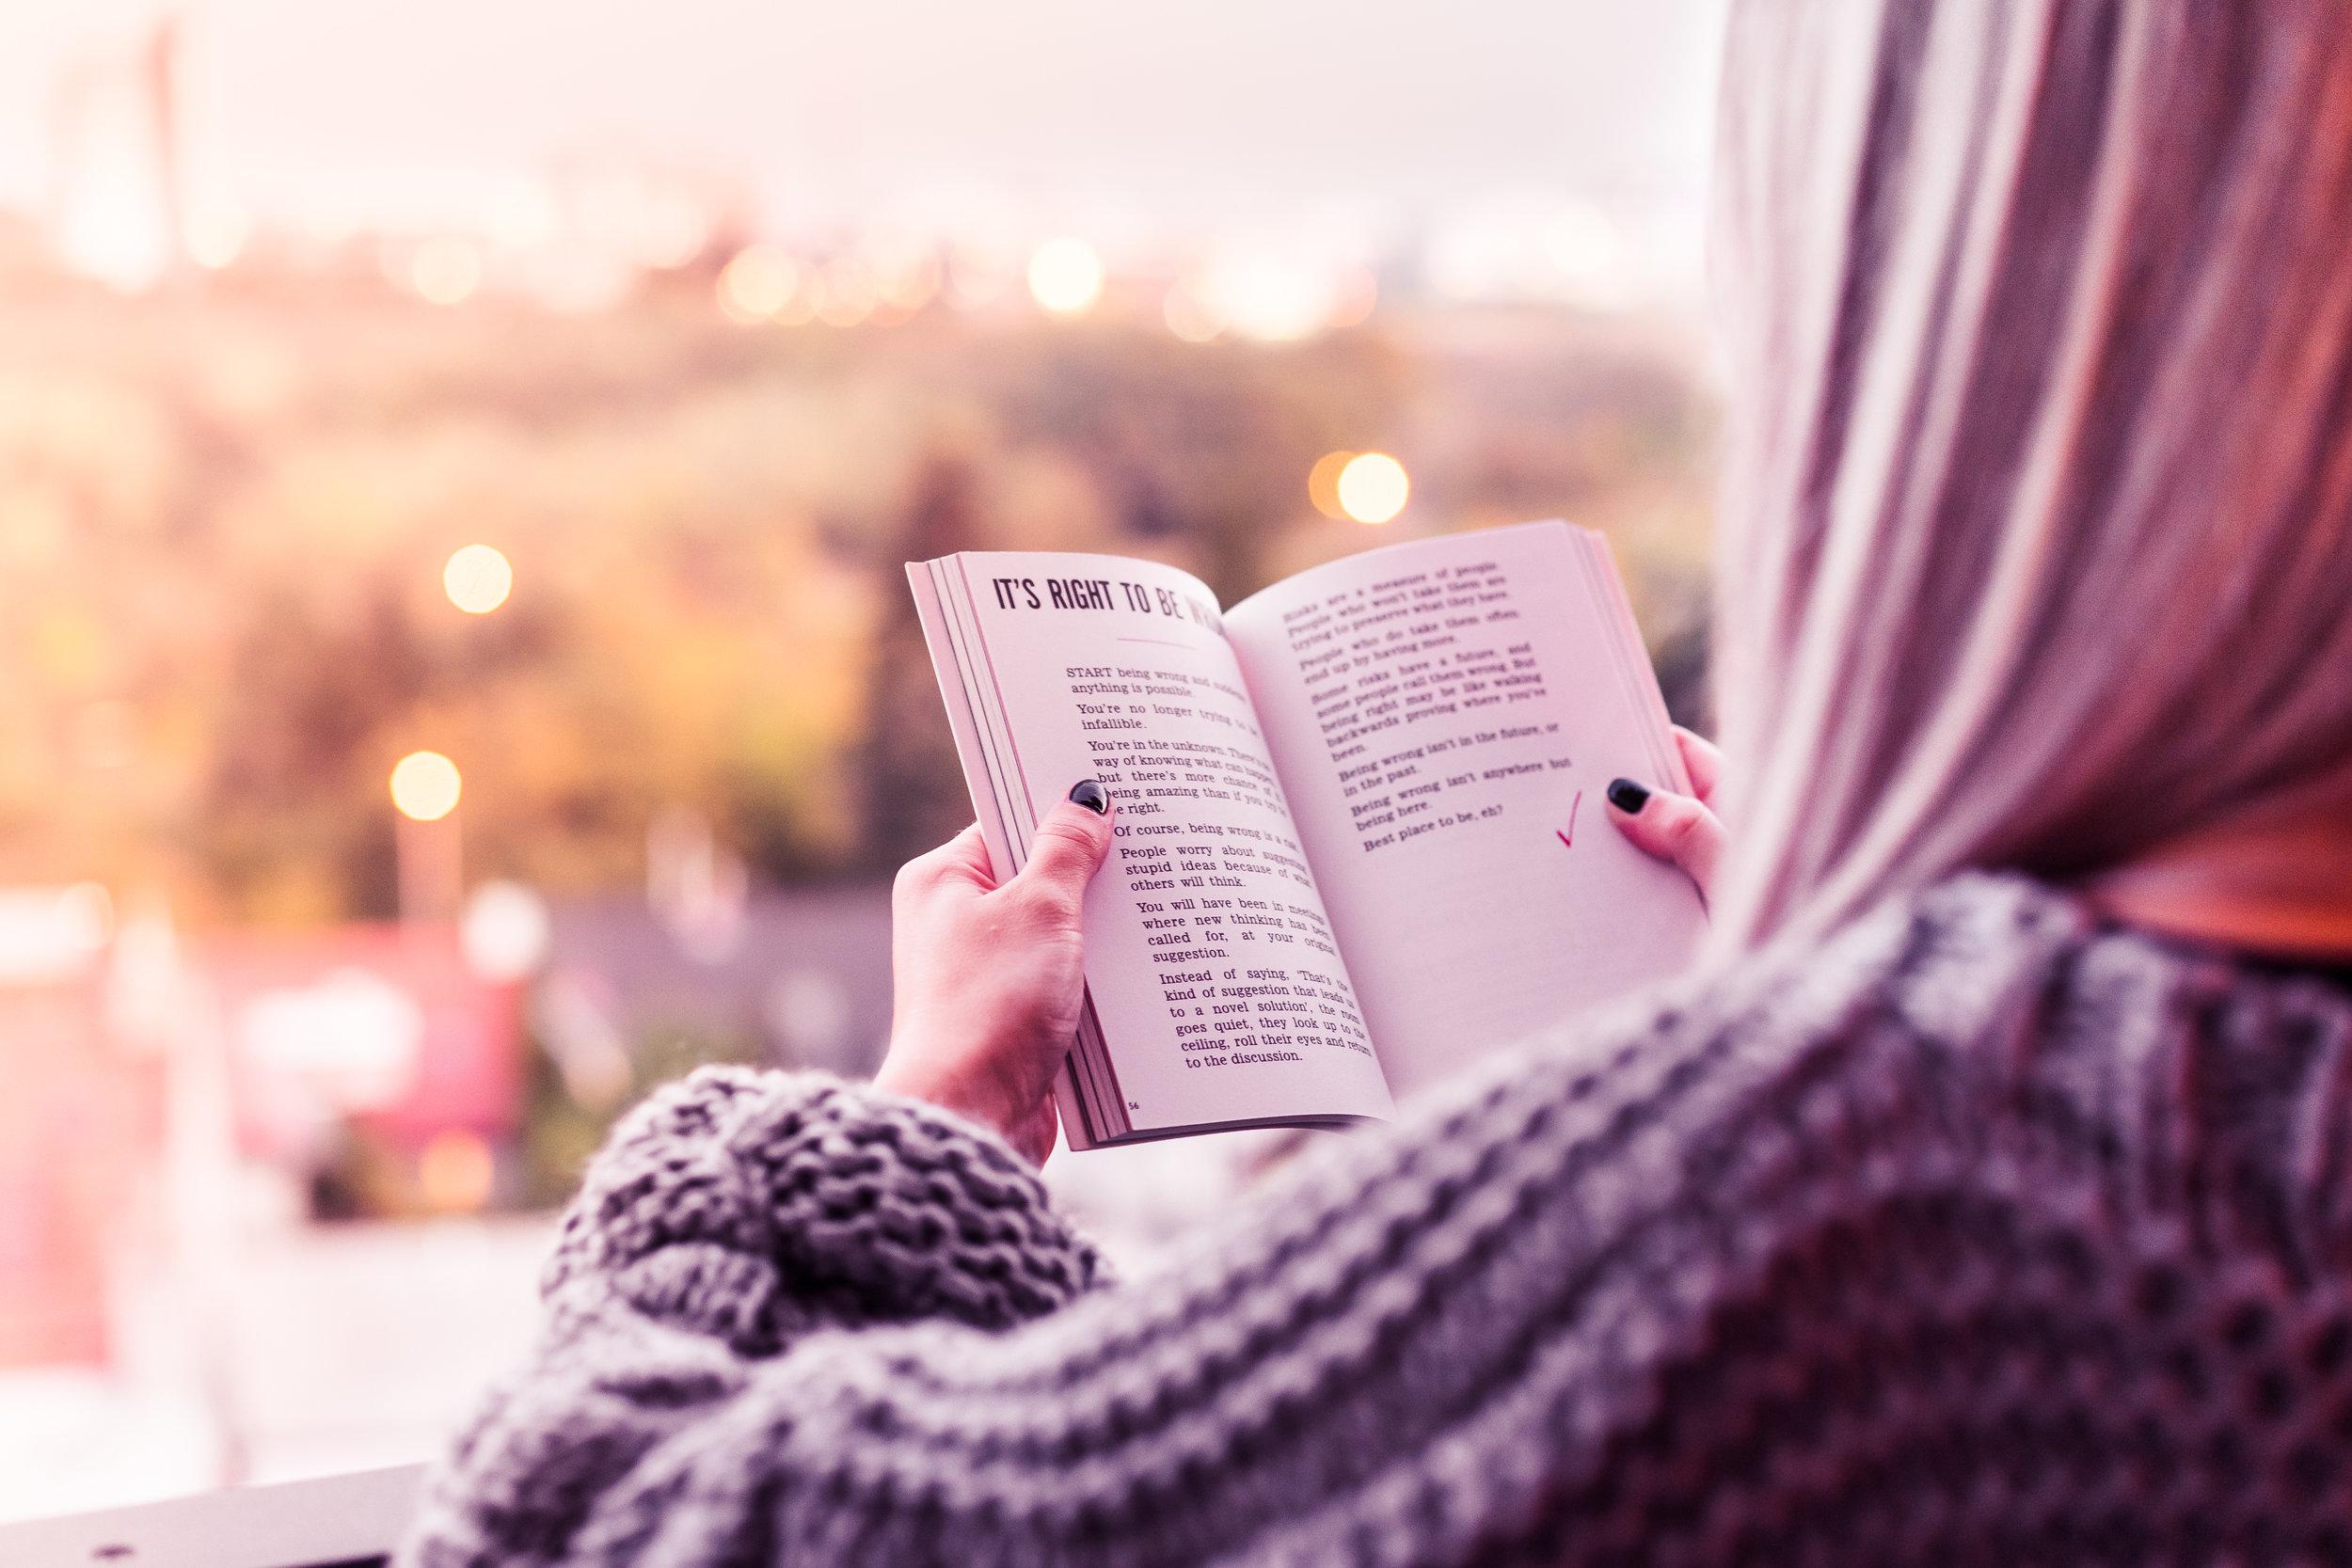 young-woman-reading-a-book-on-terrace-picjumbo-com.jpg